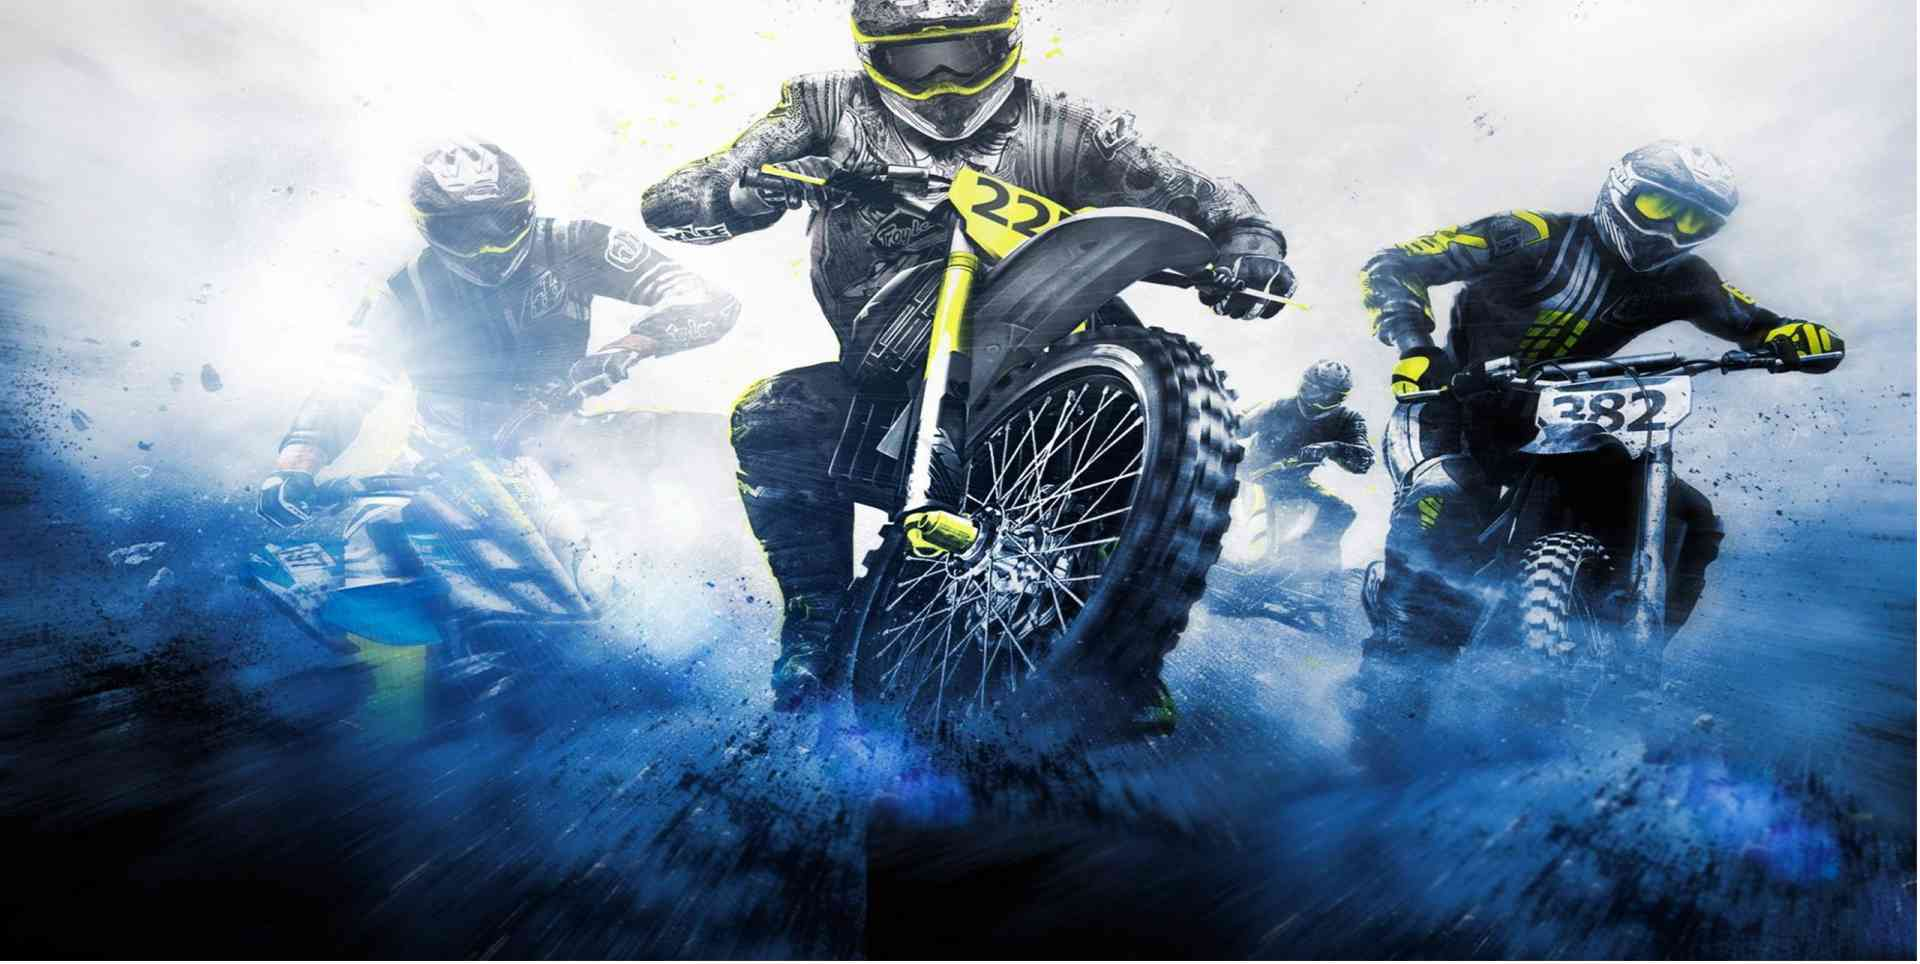 MXGP of Finland 2020 Live Stream